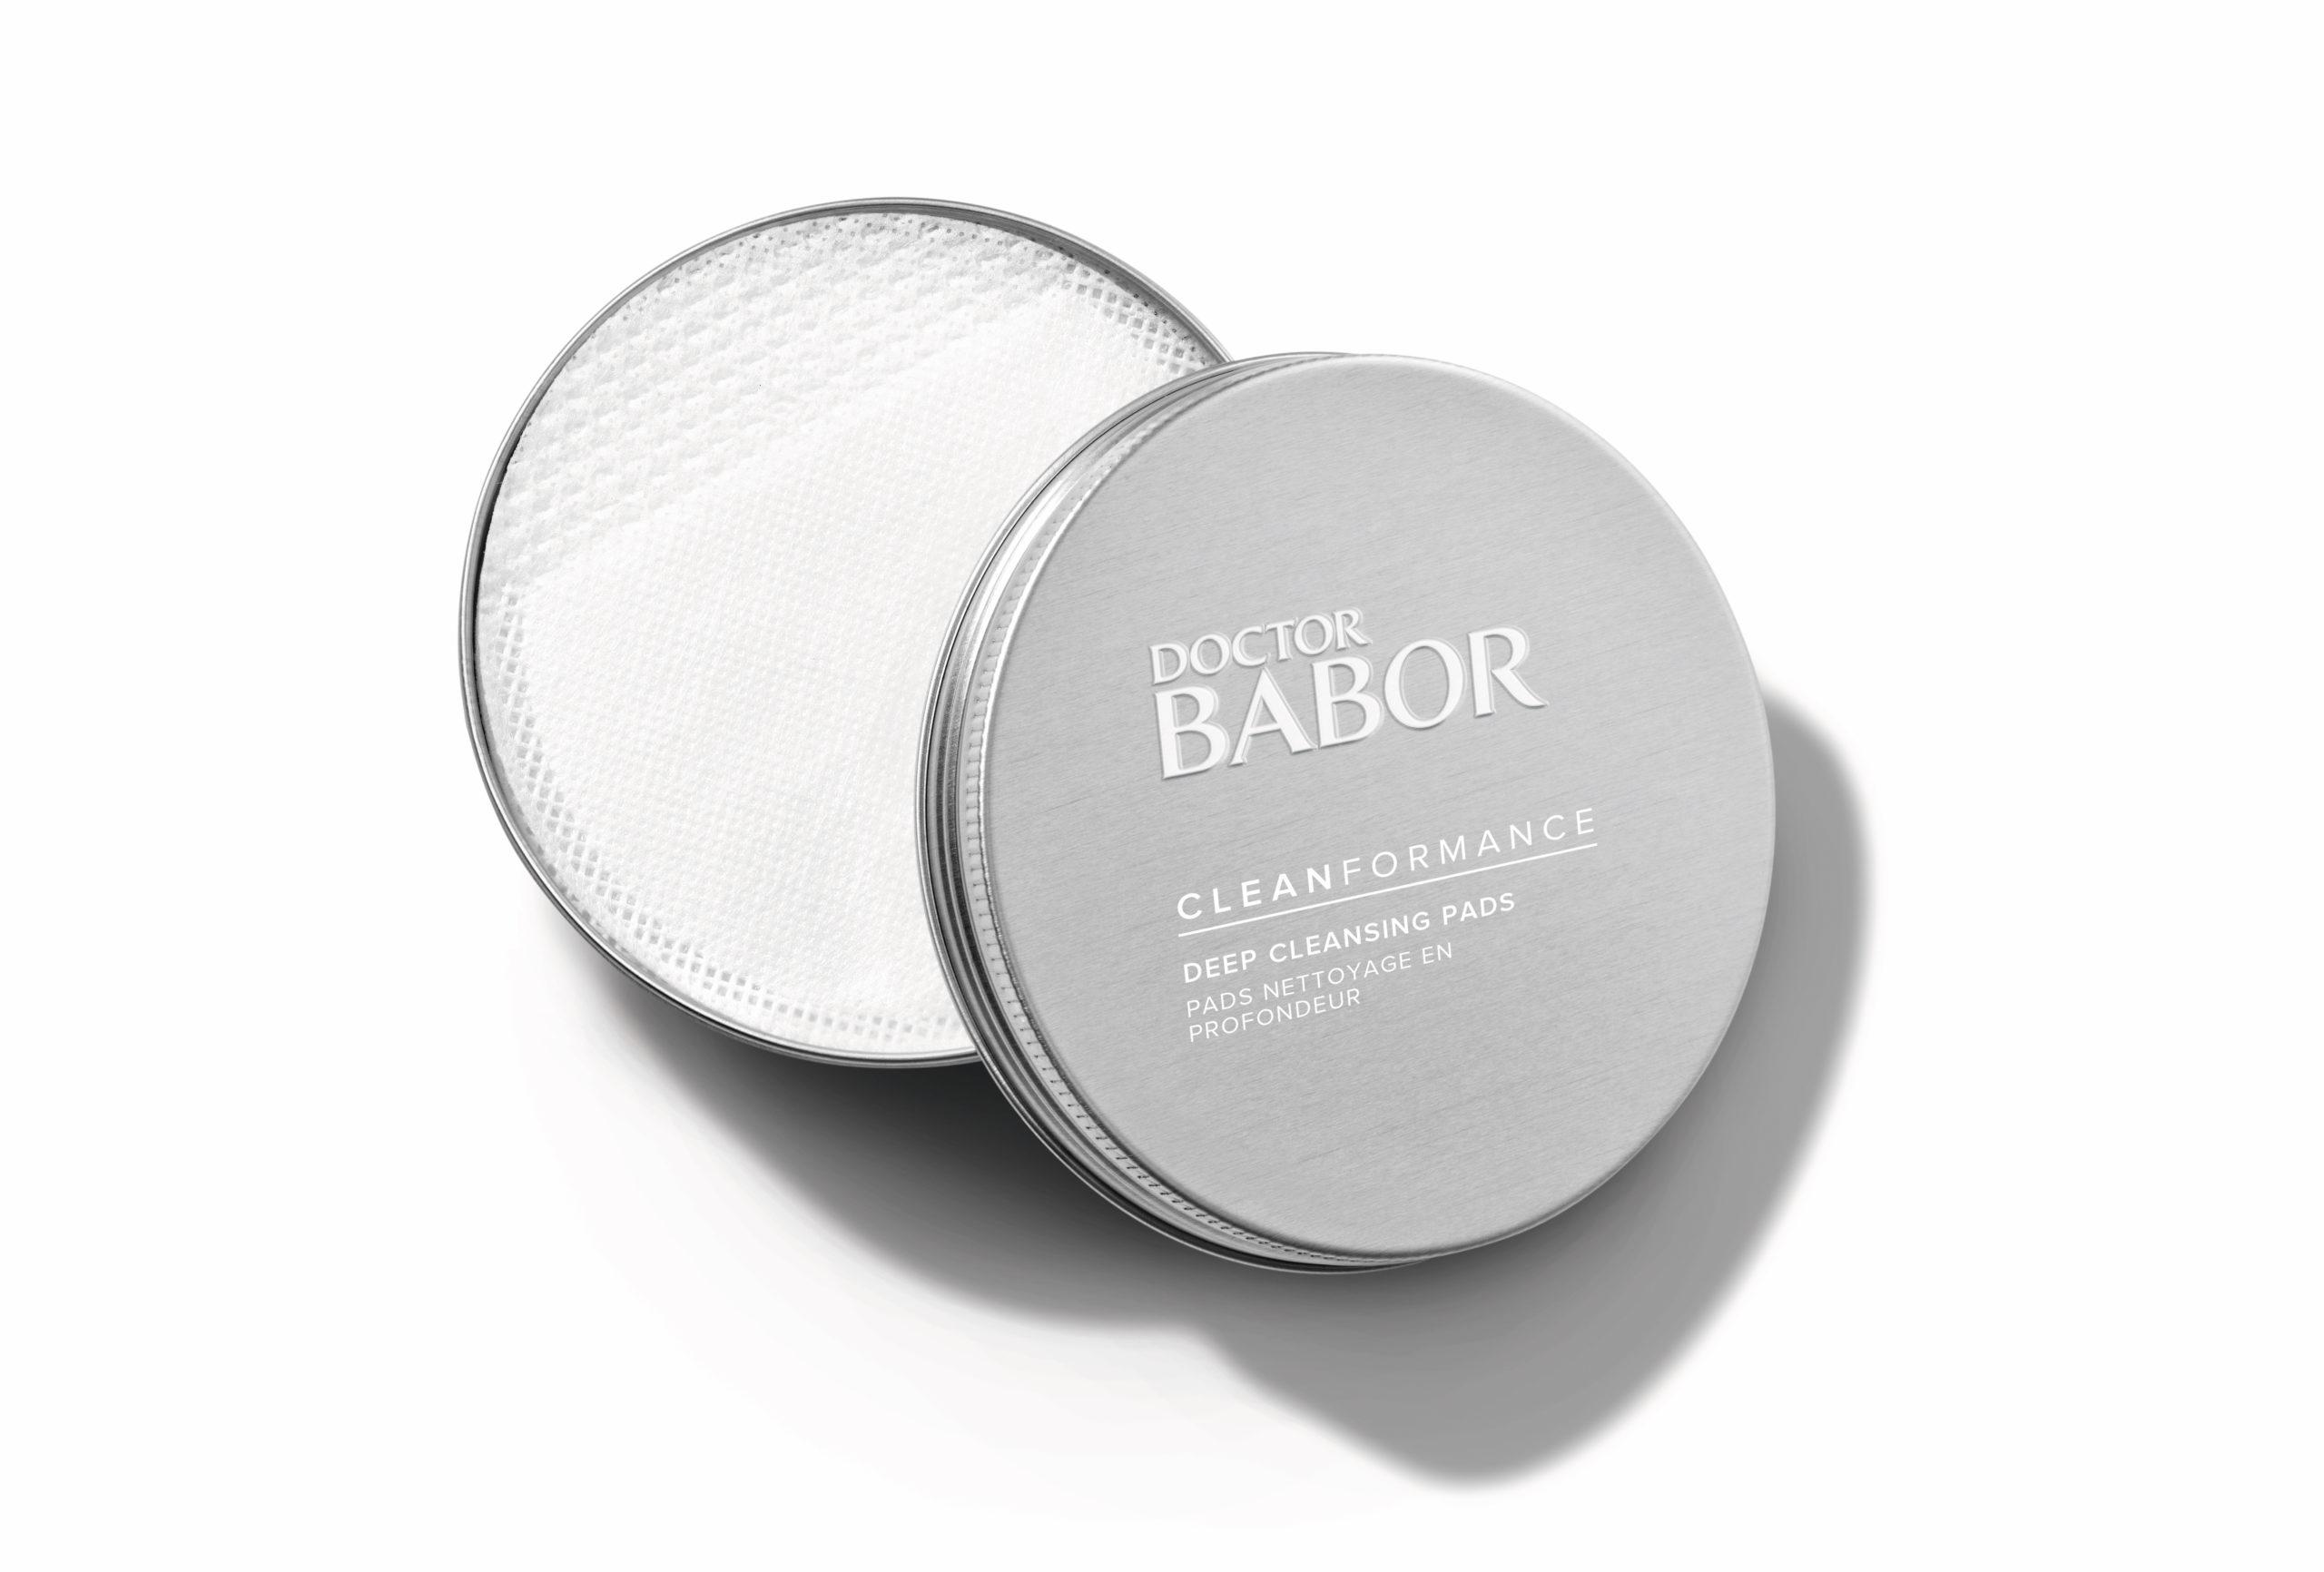 Диски для глубокого очищения кожи Babor Cleanformance, 3290 р.